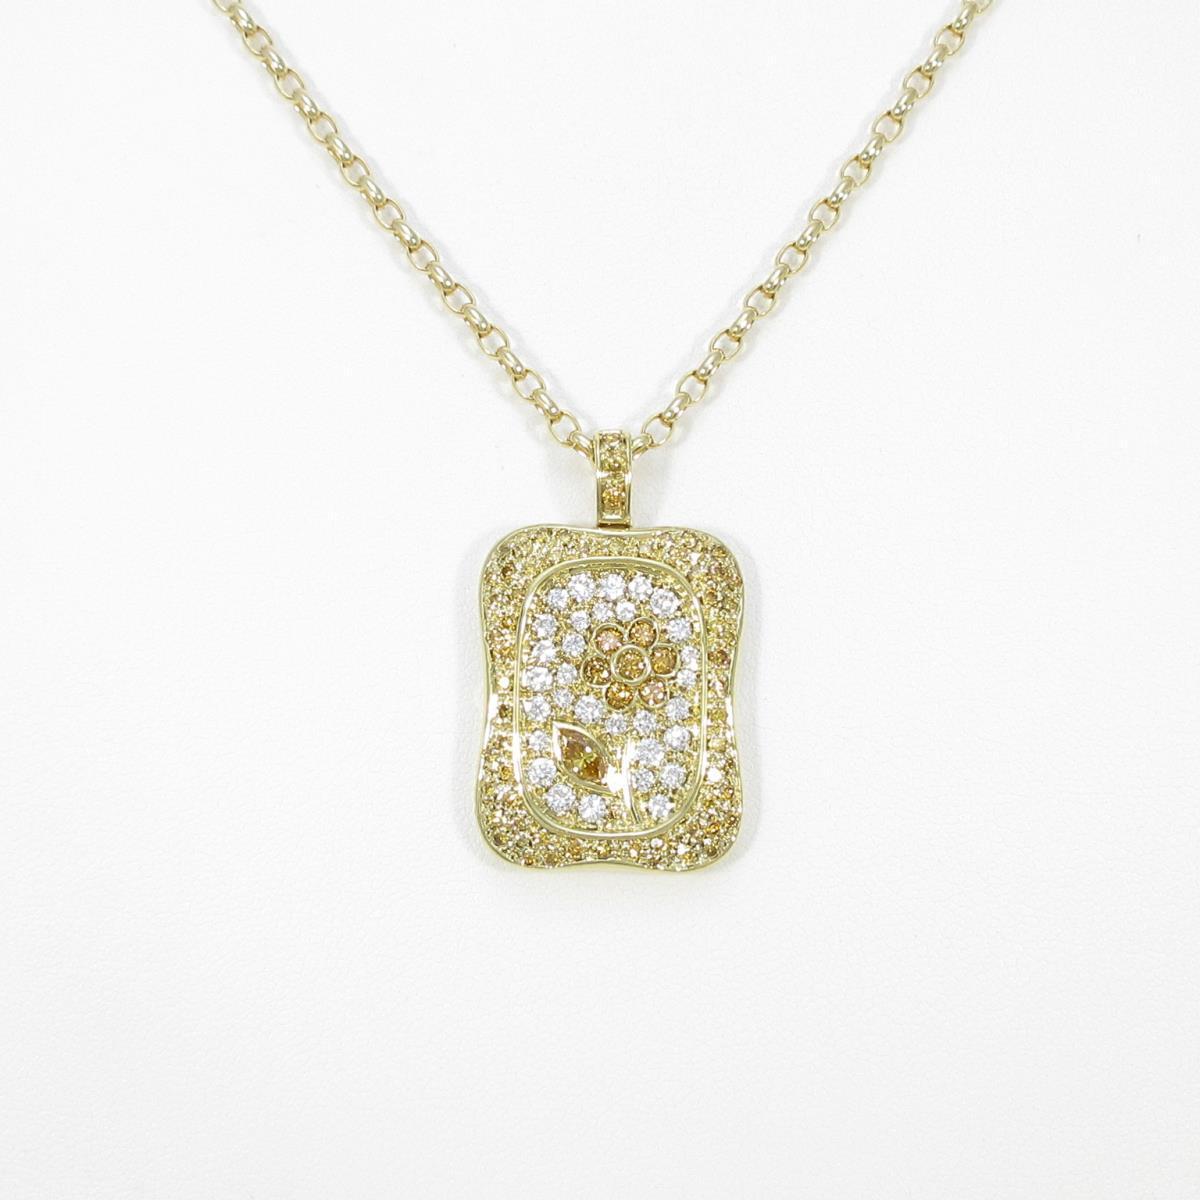 K18YG フラワー ダイヤモンドネックレス【中古】